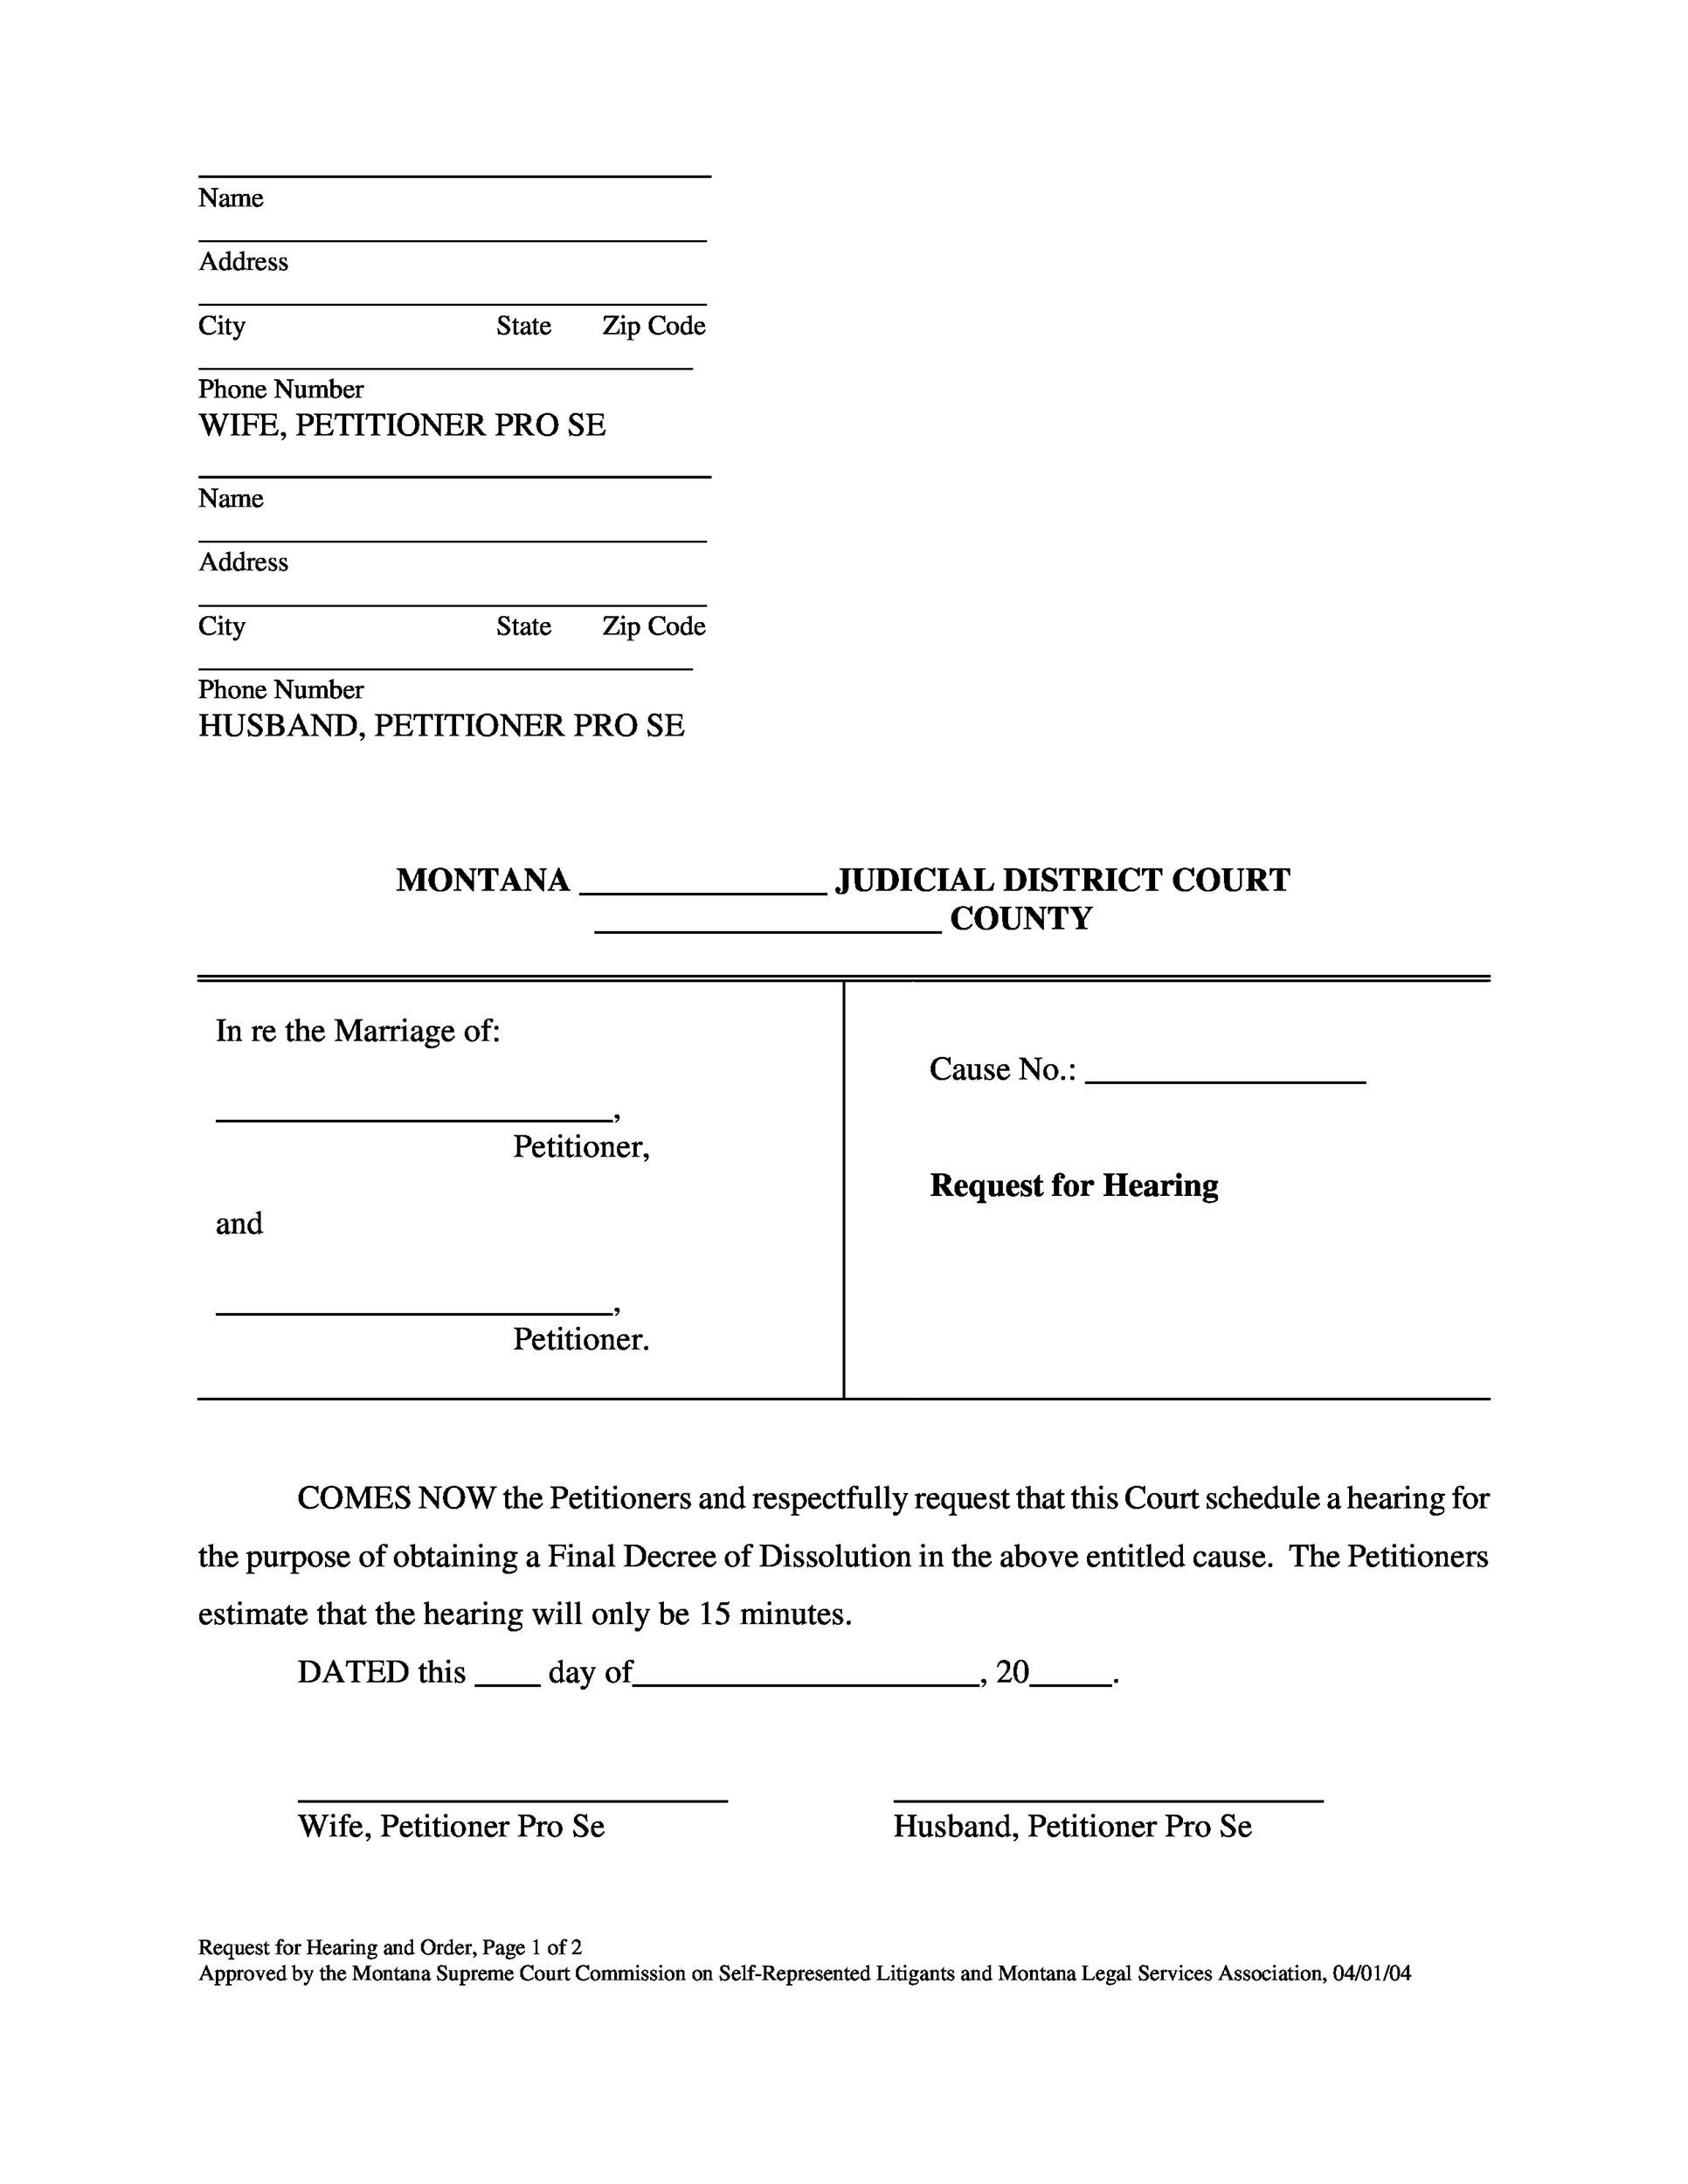 40 Free Divorce Papers (Printable) - Template Lab - printable divorce papers for free